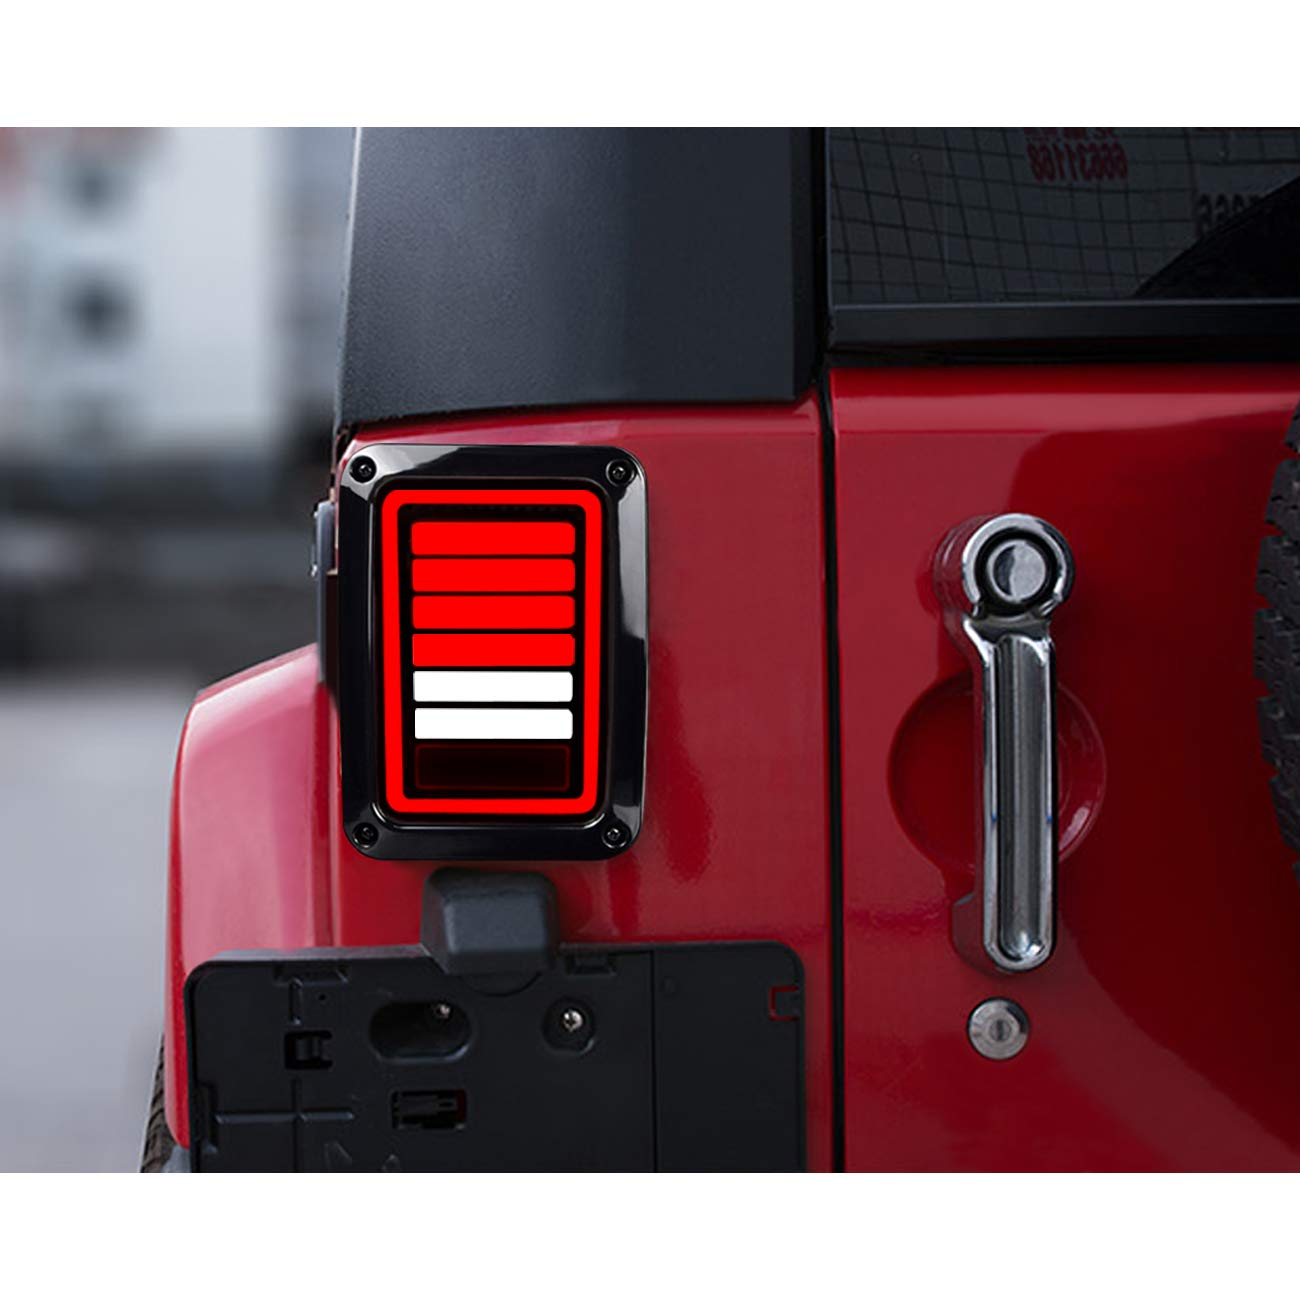 Pair 6 Bar Style ICARS Upgraded 2007-2018 Jeep Wrangler JK JKU Tail Lights Brake Lights LED Smoke Lens with Turn Signal Lights